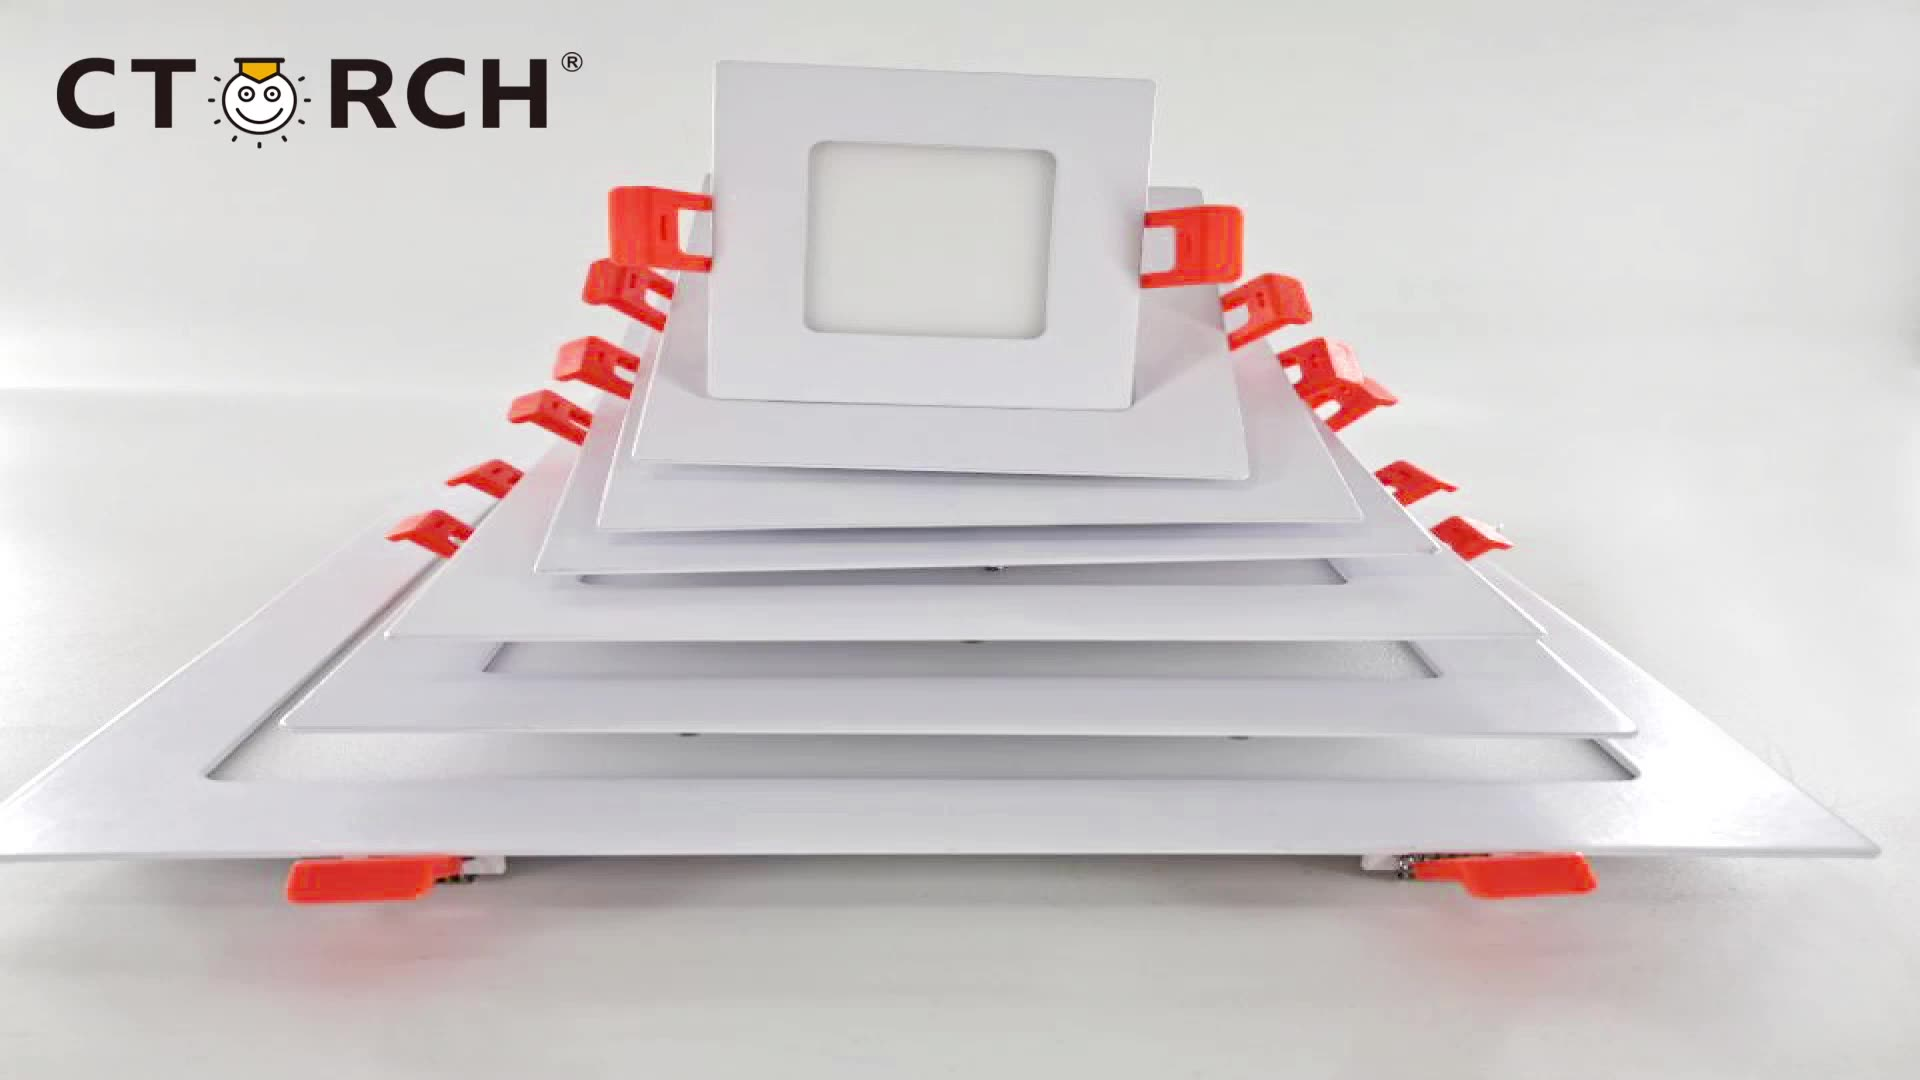 CTORCH Installation Square Slim Aluminum Ceiling Led Panel Light With 3W 6W 9W 12W 15W 18W 24W